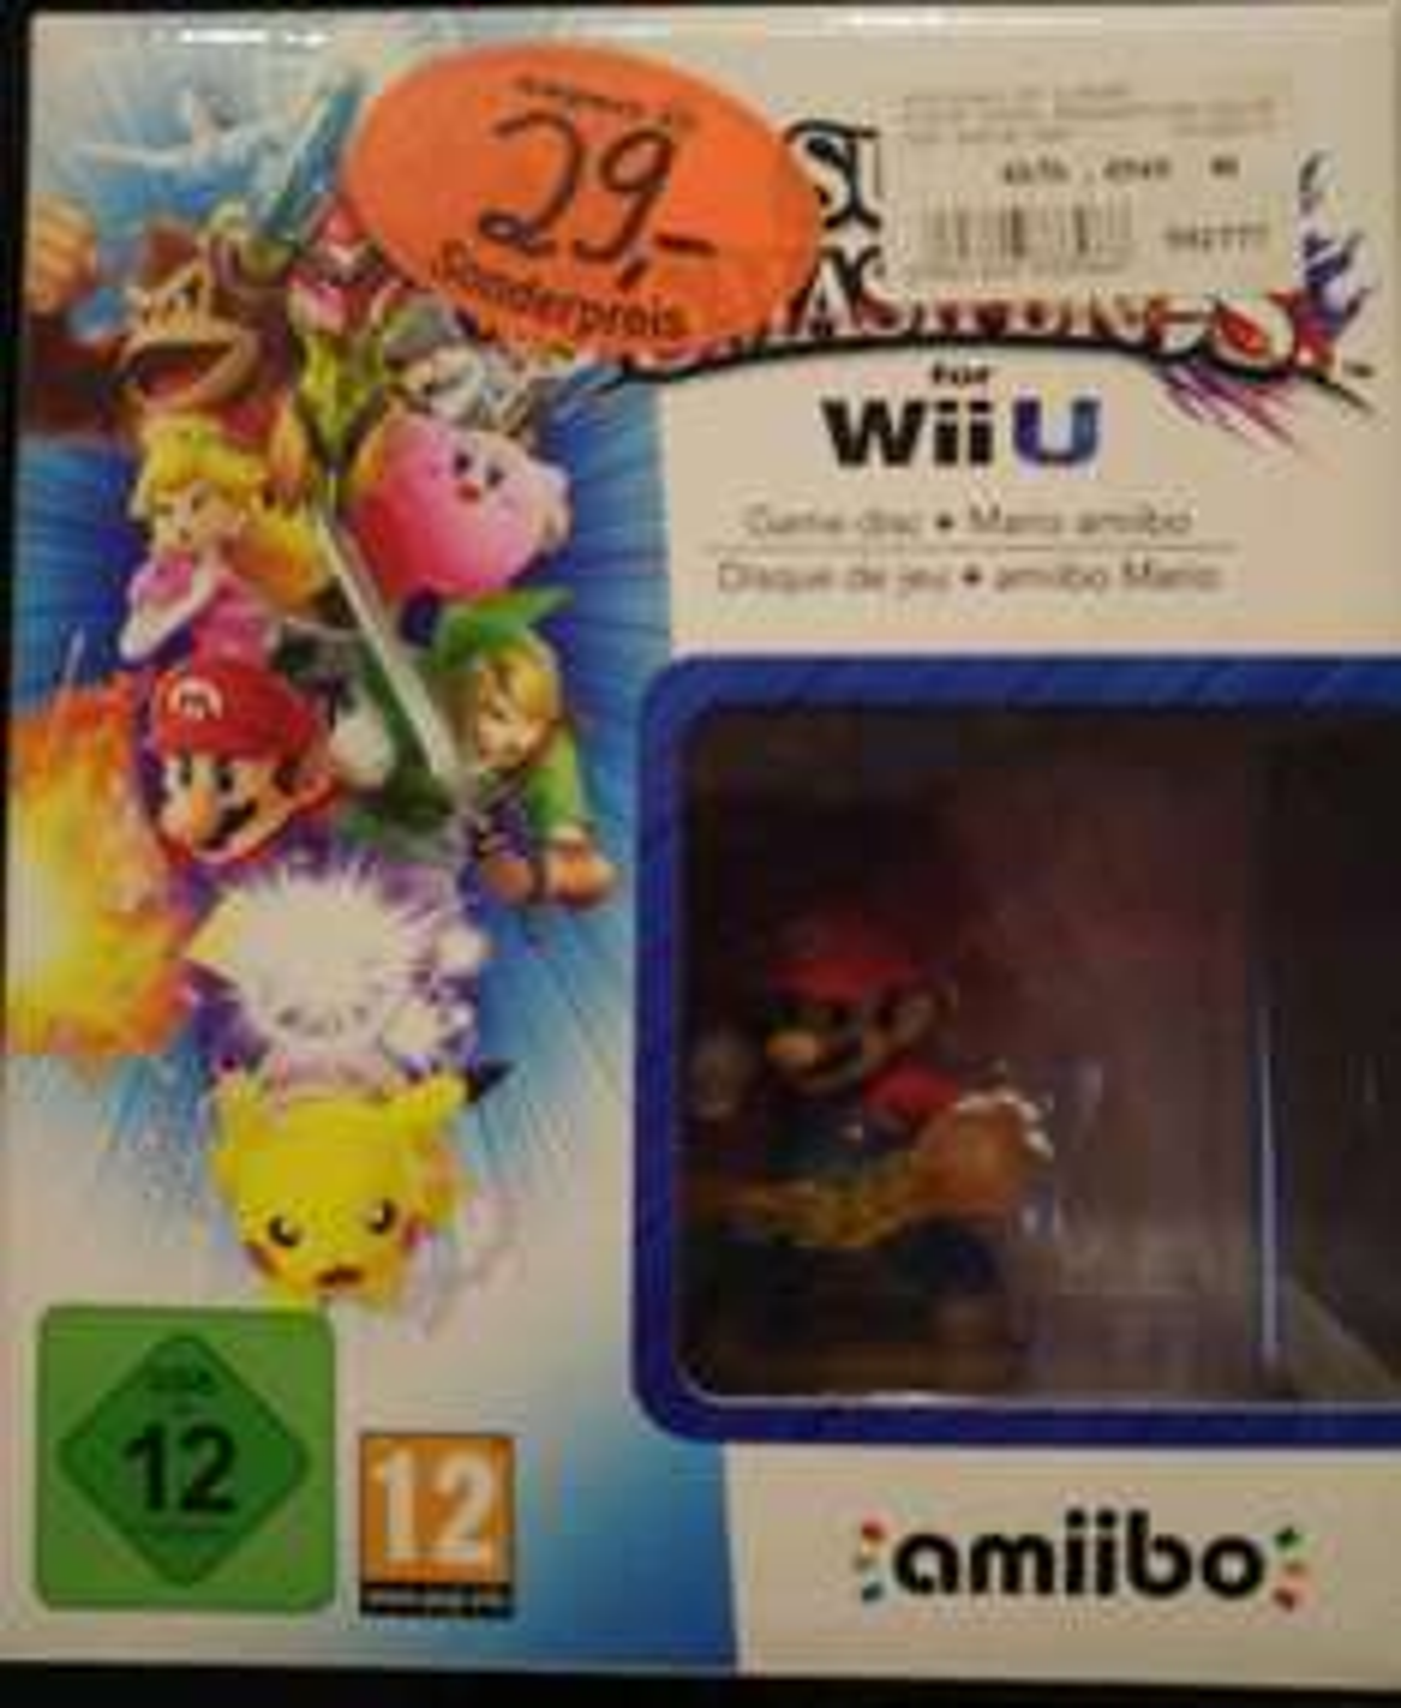 [Lokal Bayreuth] Super Smash Bros inkl. Amiibo (Wii U) für 29€ bei Expert Jakob